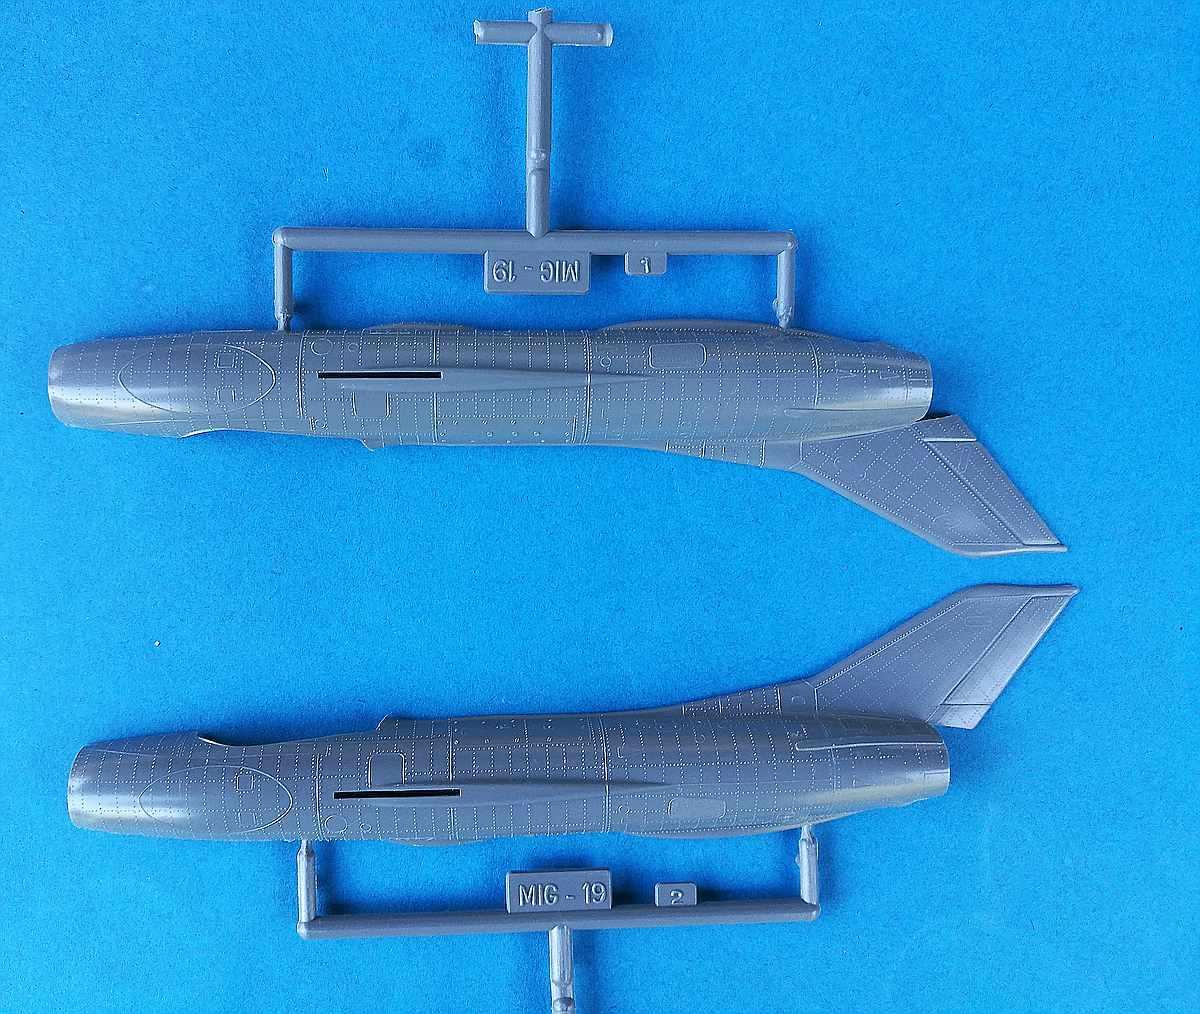 Heller-L-251-MiG-19-6 Kit-Archäologie: MiG-19 in 1:72 von Heller # L 251